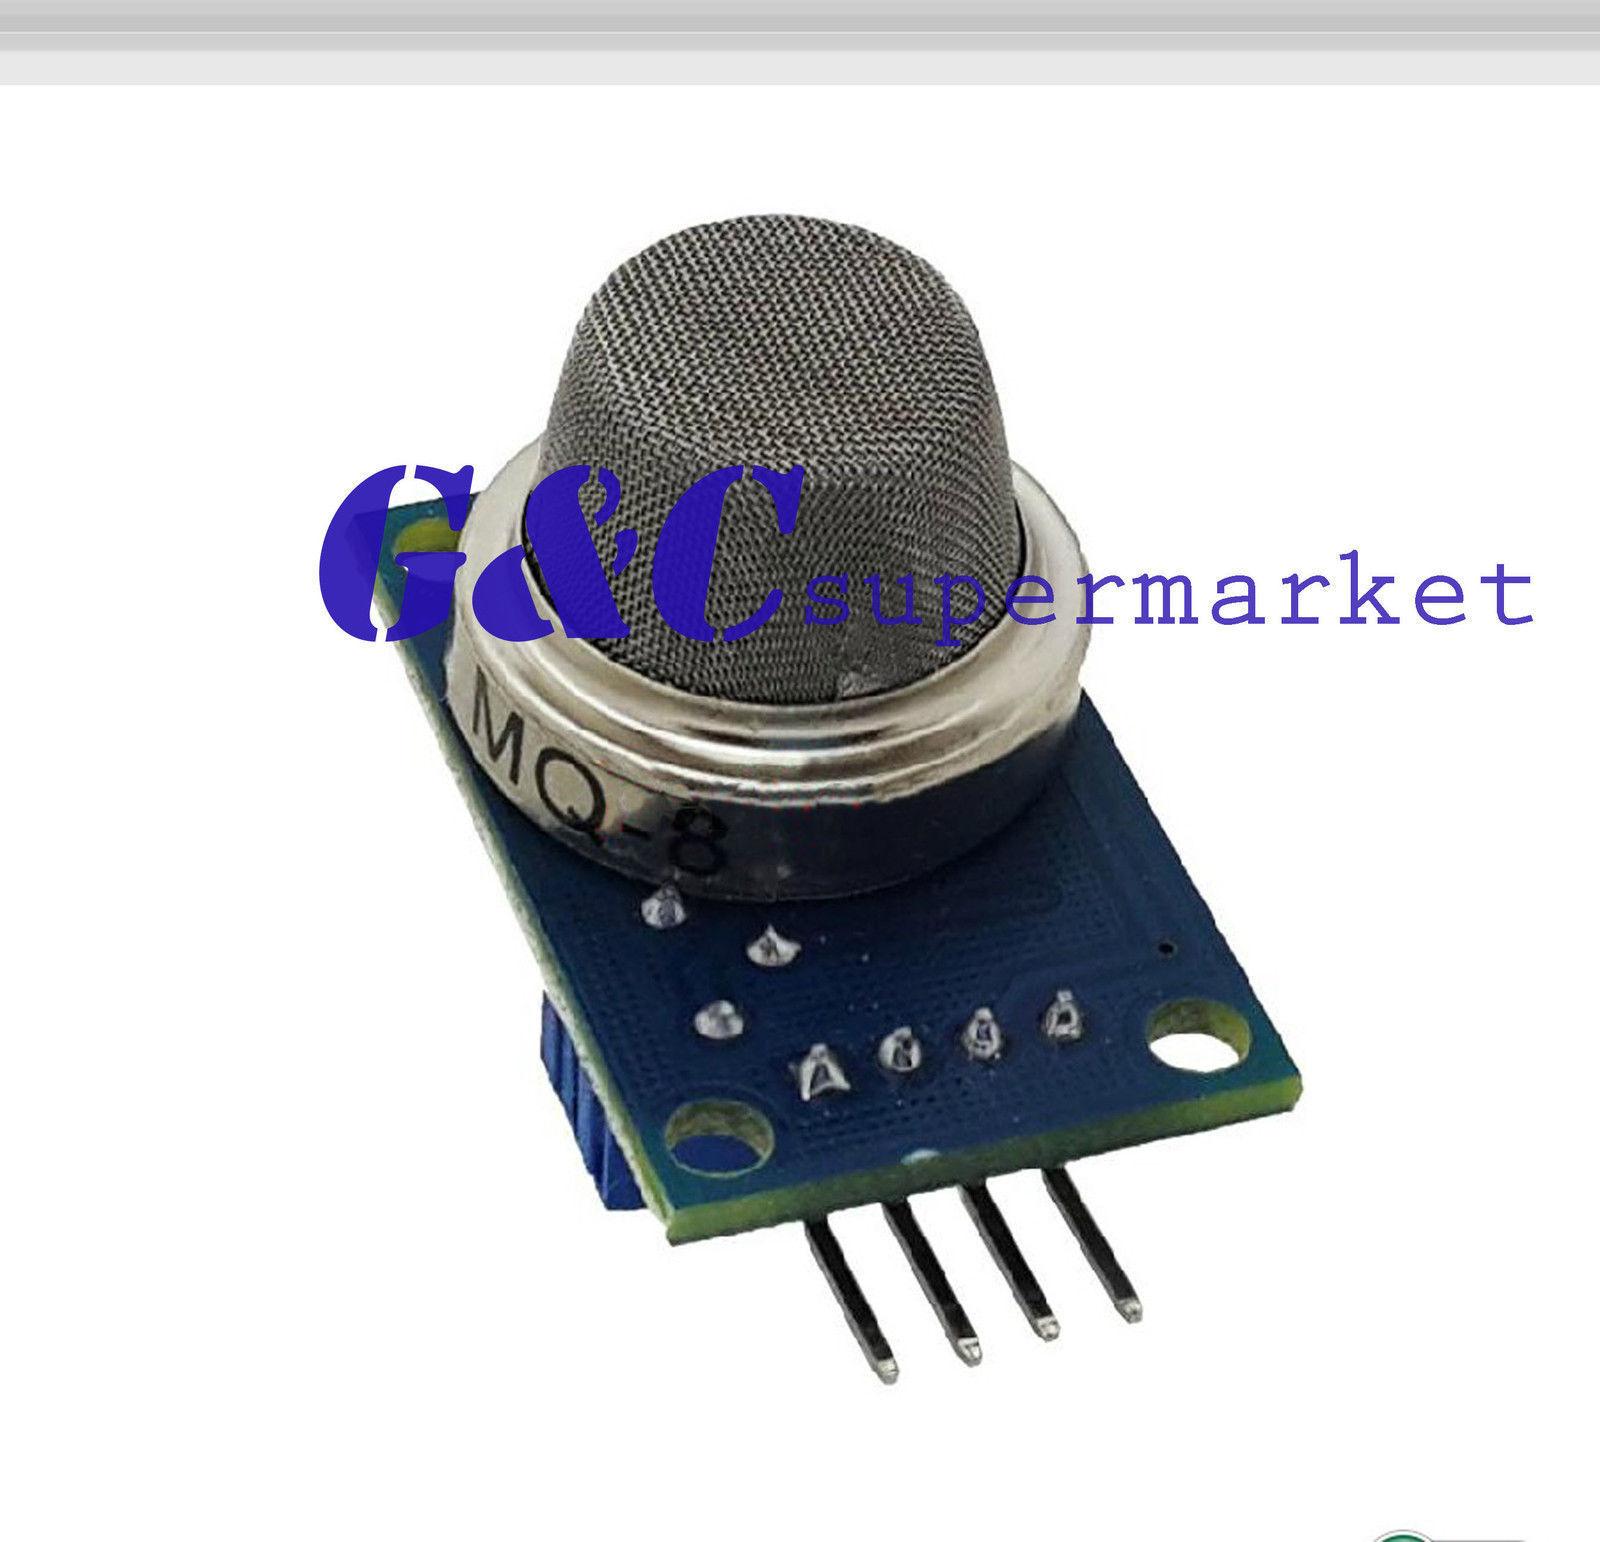 1pcs Mq8 Mq 8 Hydrogen Gas Sensor Module For 240w Electronic Ballast Circuit Ir2104 Atmega48 Controlled Arduino M27